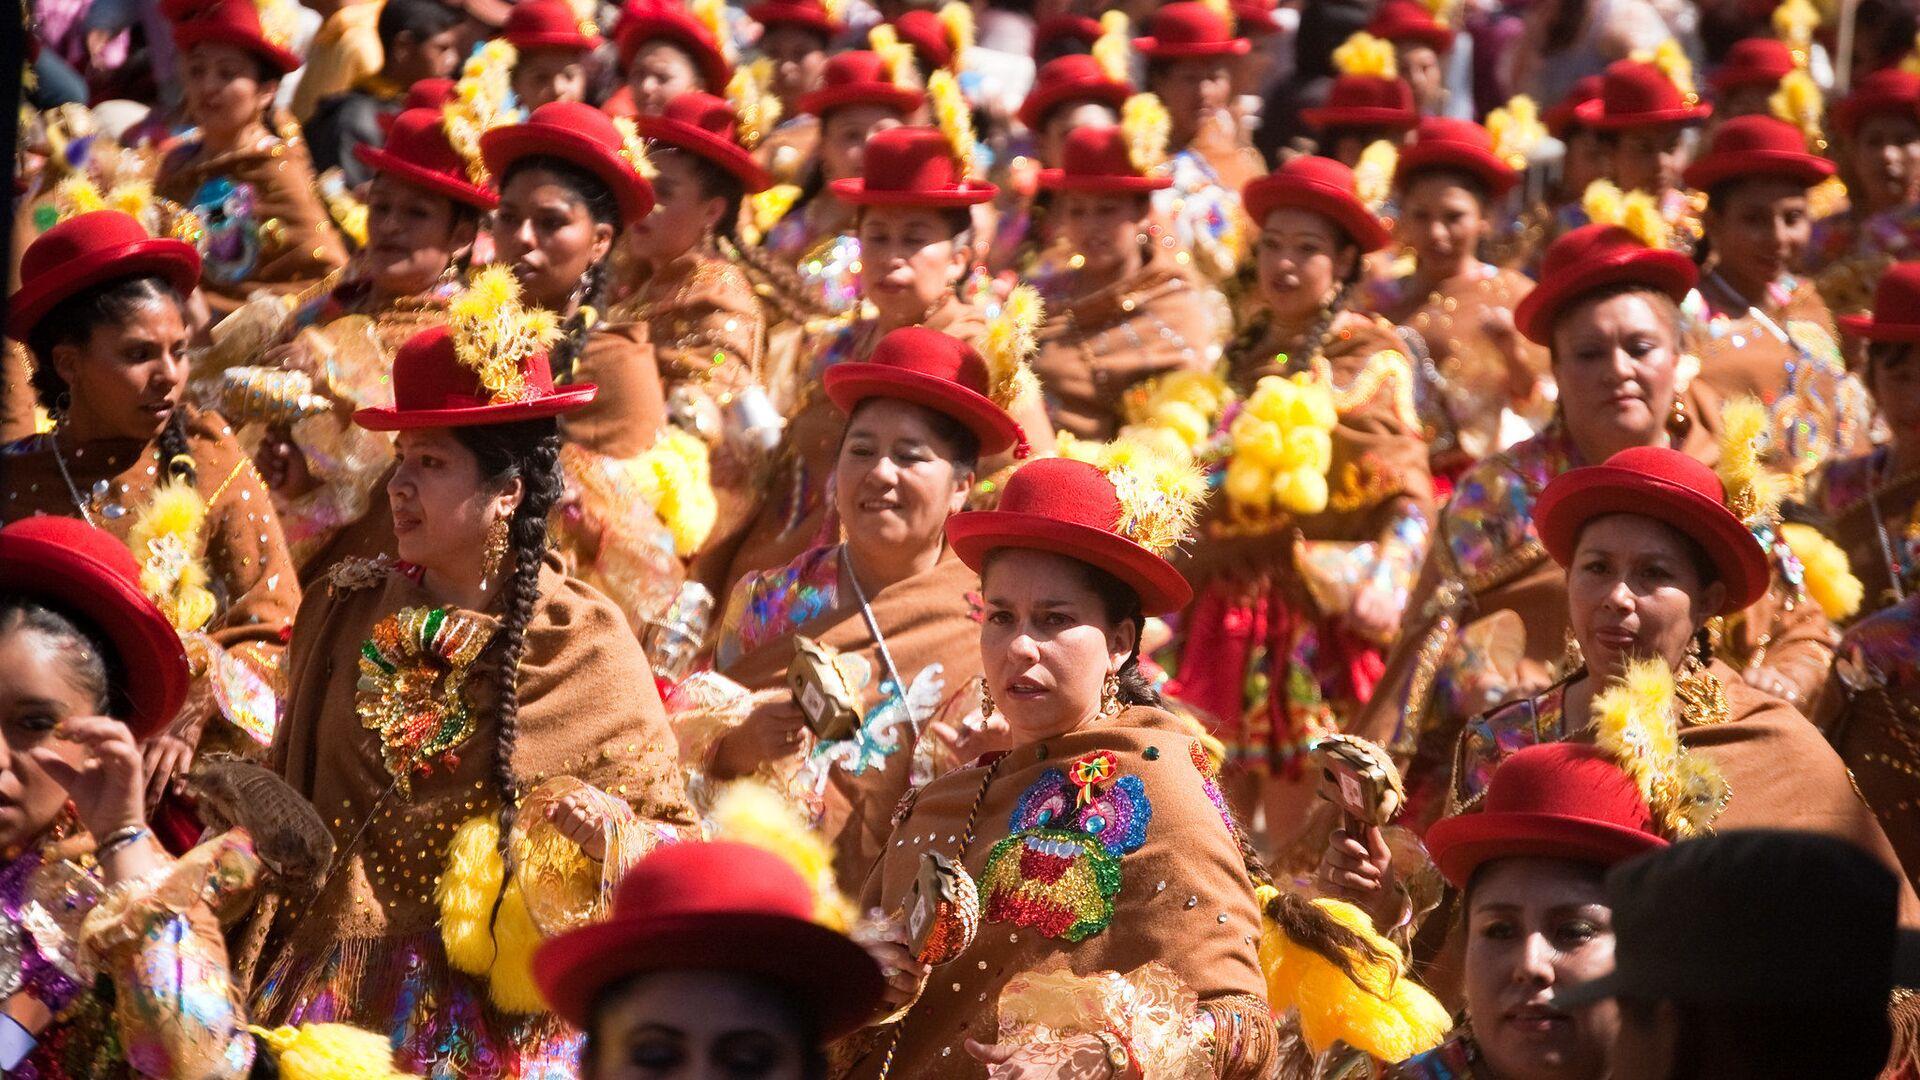 Desfile de carnaval en Oruro, Bolivia - Sputnik Mundo, 1920, 14.05.2021